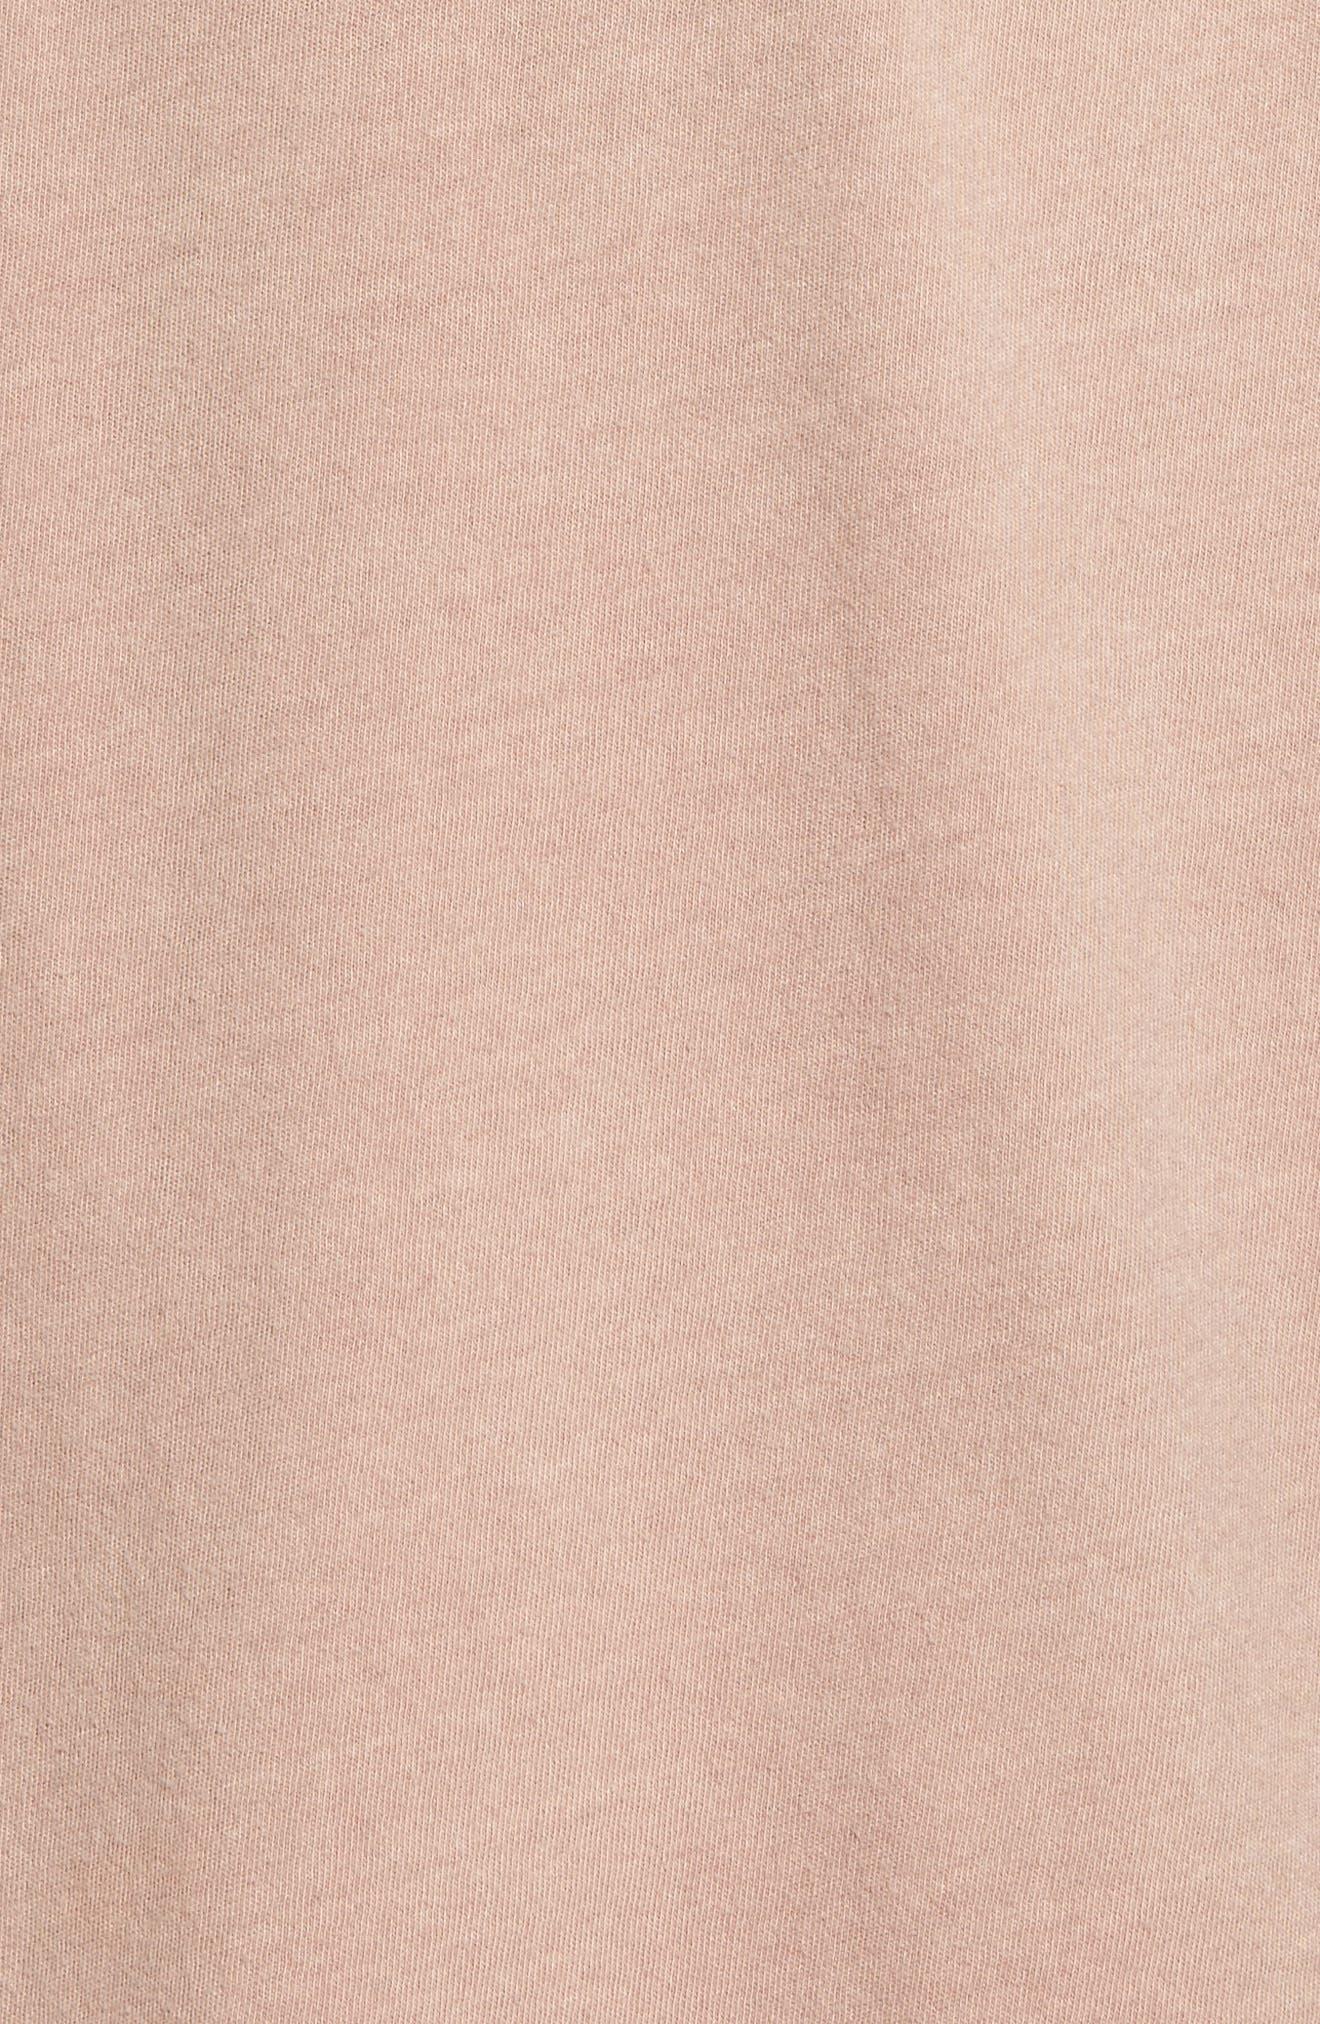 Mineral Wash T-Shirt,                             Alternate thumbnail 5, color,                             Pink Adobe